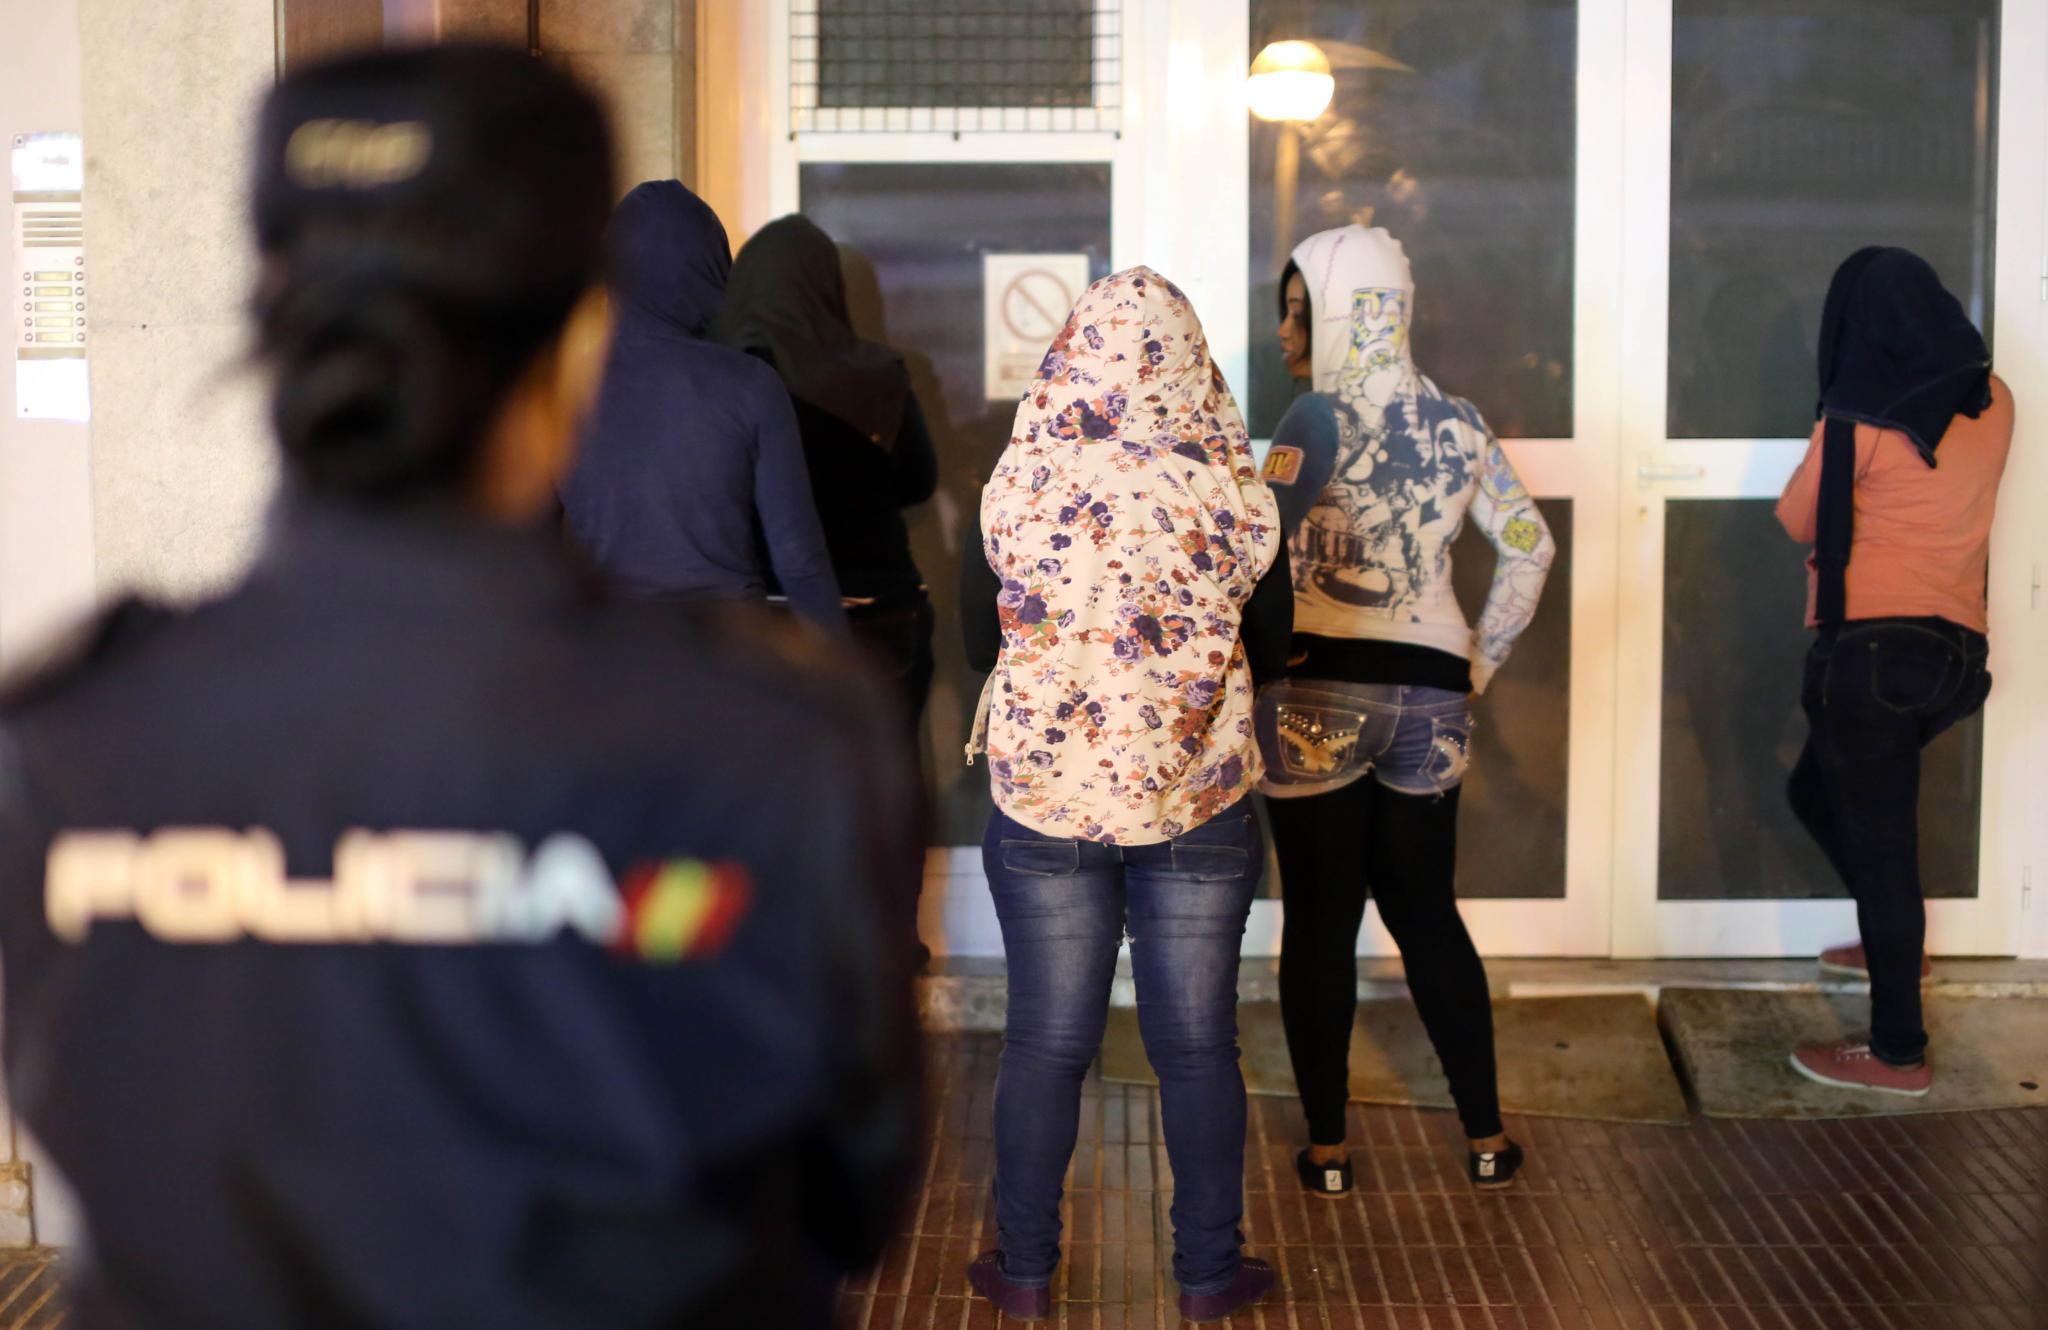 Street prostitution in Palma on the decrease » Balearics